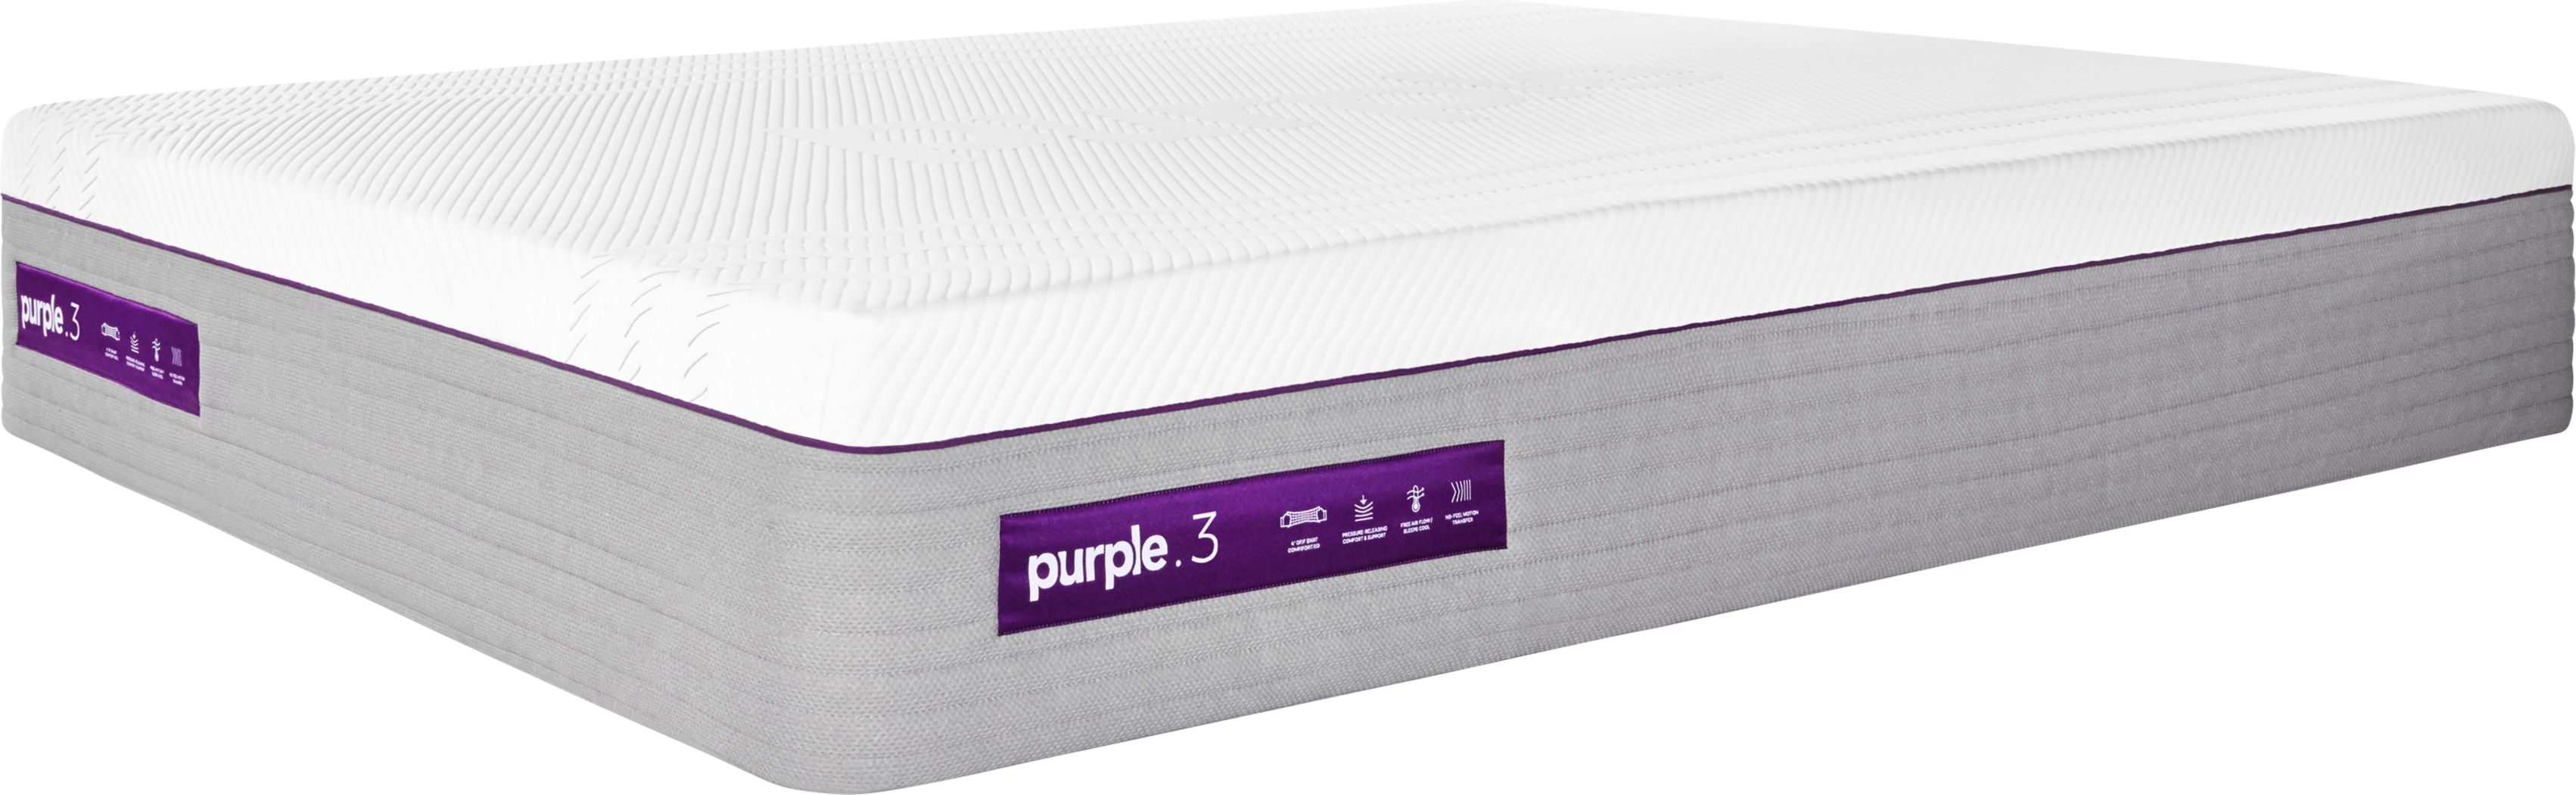 Purple Hybrid Premier 3 King Mattress